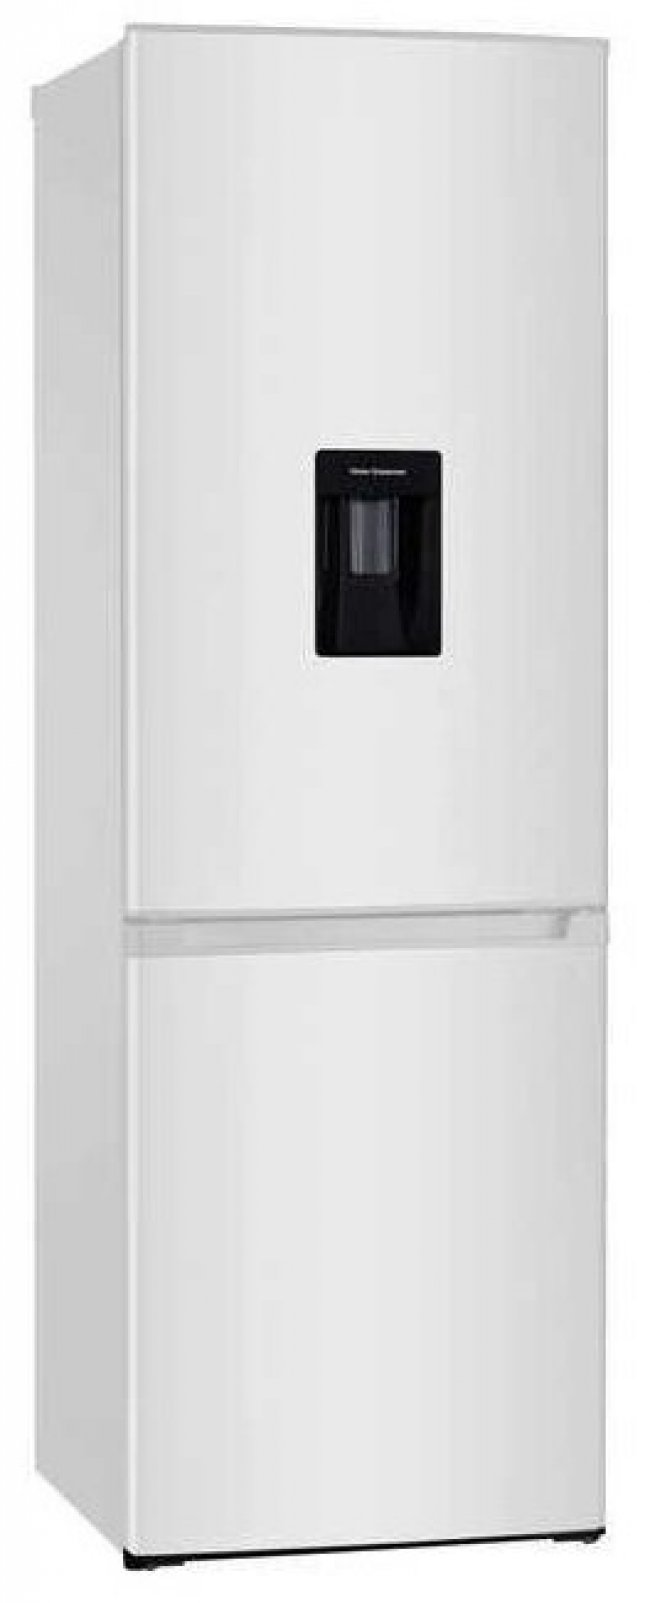 Хладилник Crown CBR-310D